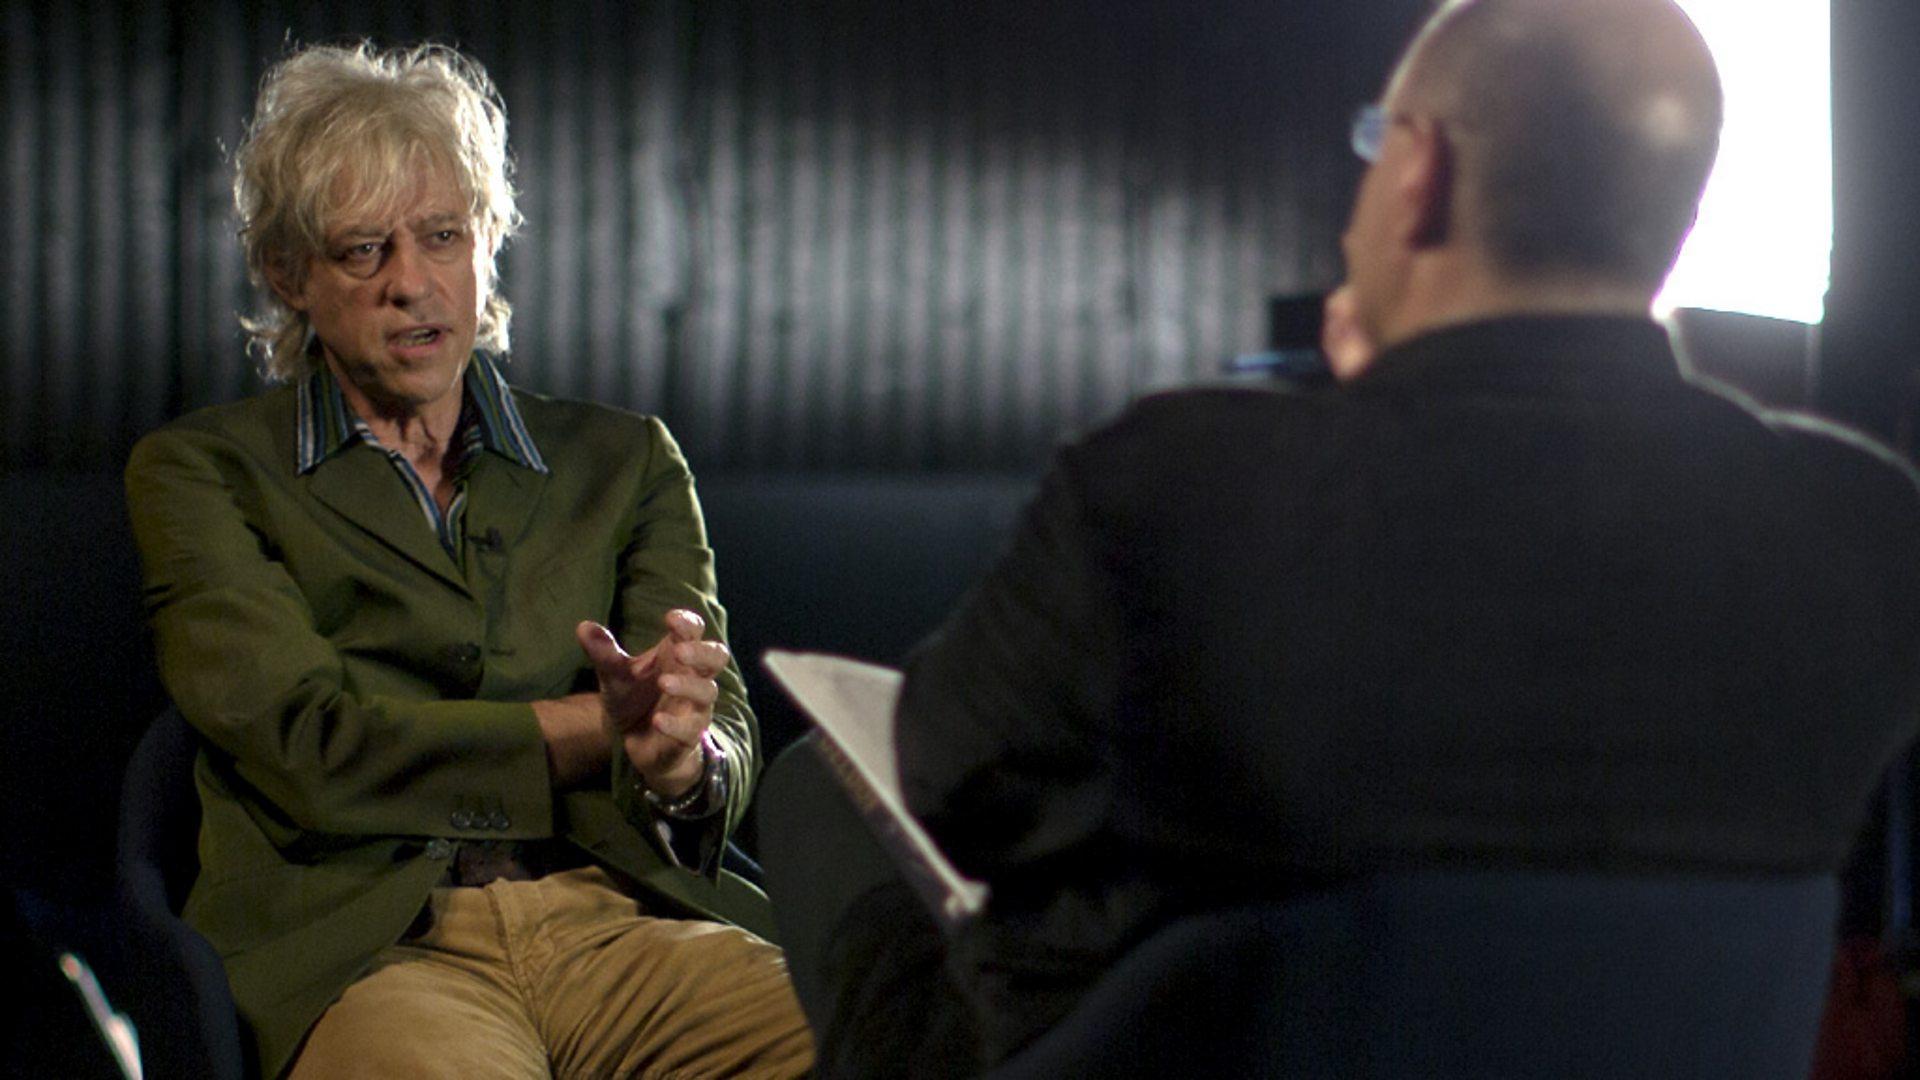 Watch UPDATE: BBC in talks with Geldof for Live Aid II akaLive 8' video